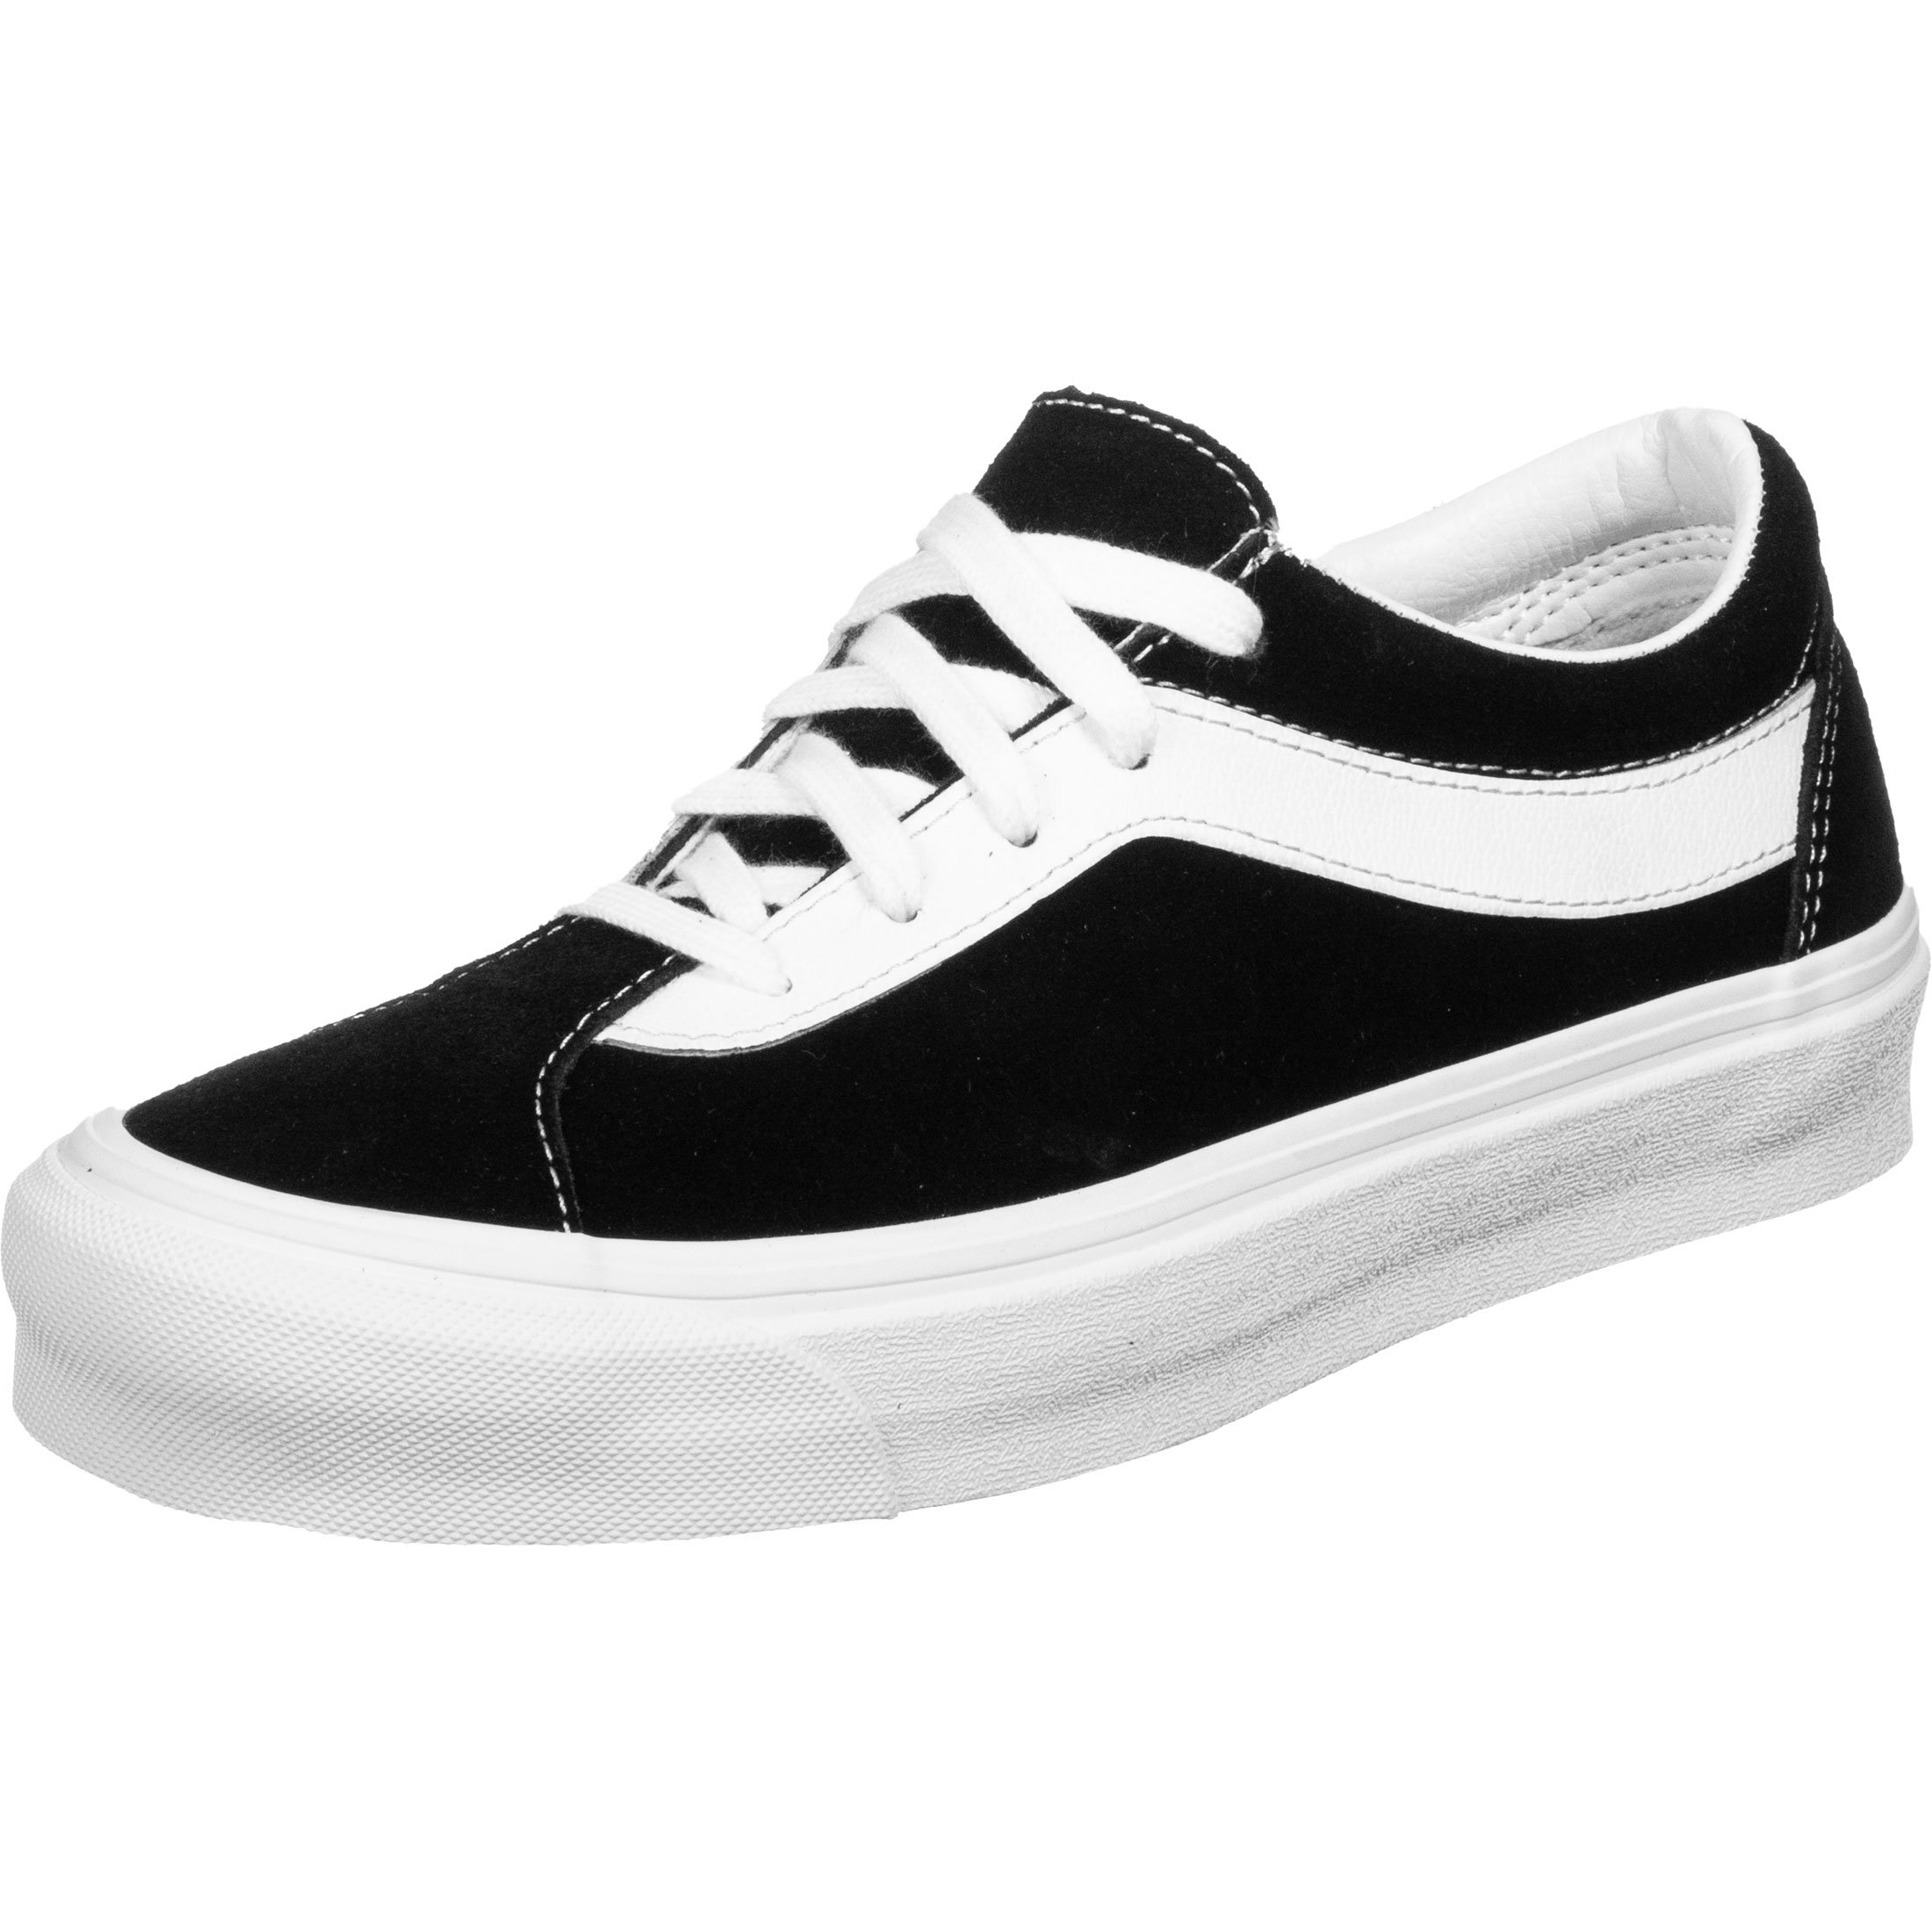 Vans Bold NI - Sneakers Low at Stylefile